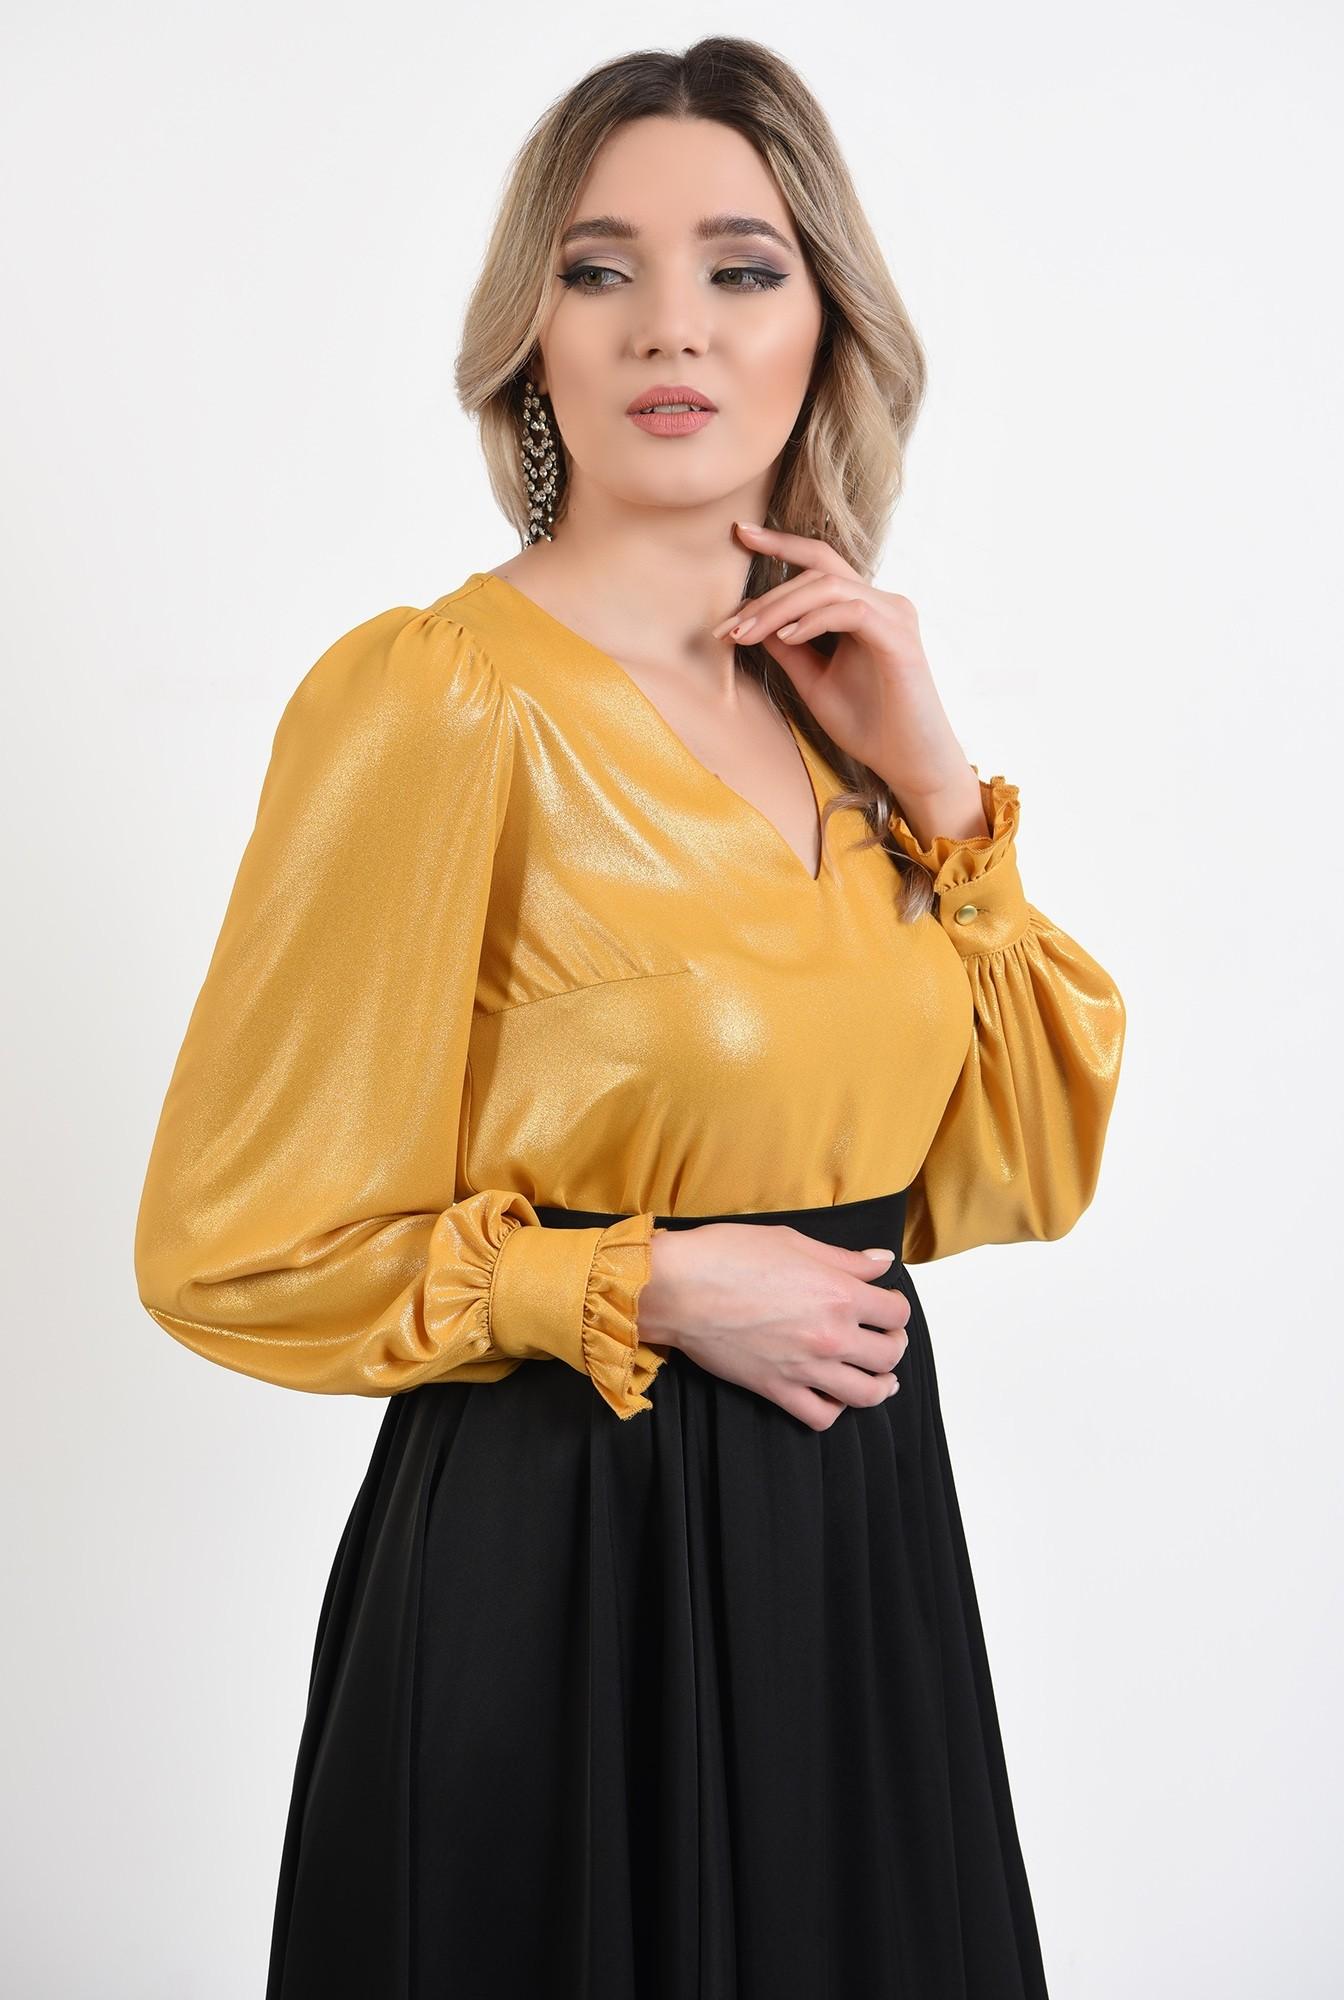 2 -  bluza eleganta, mustar, cu maneci bufante, cu anchior, tesatura lucioasa